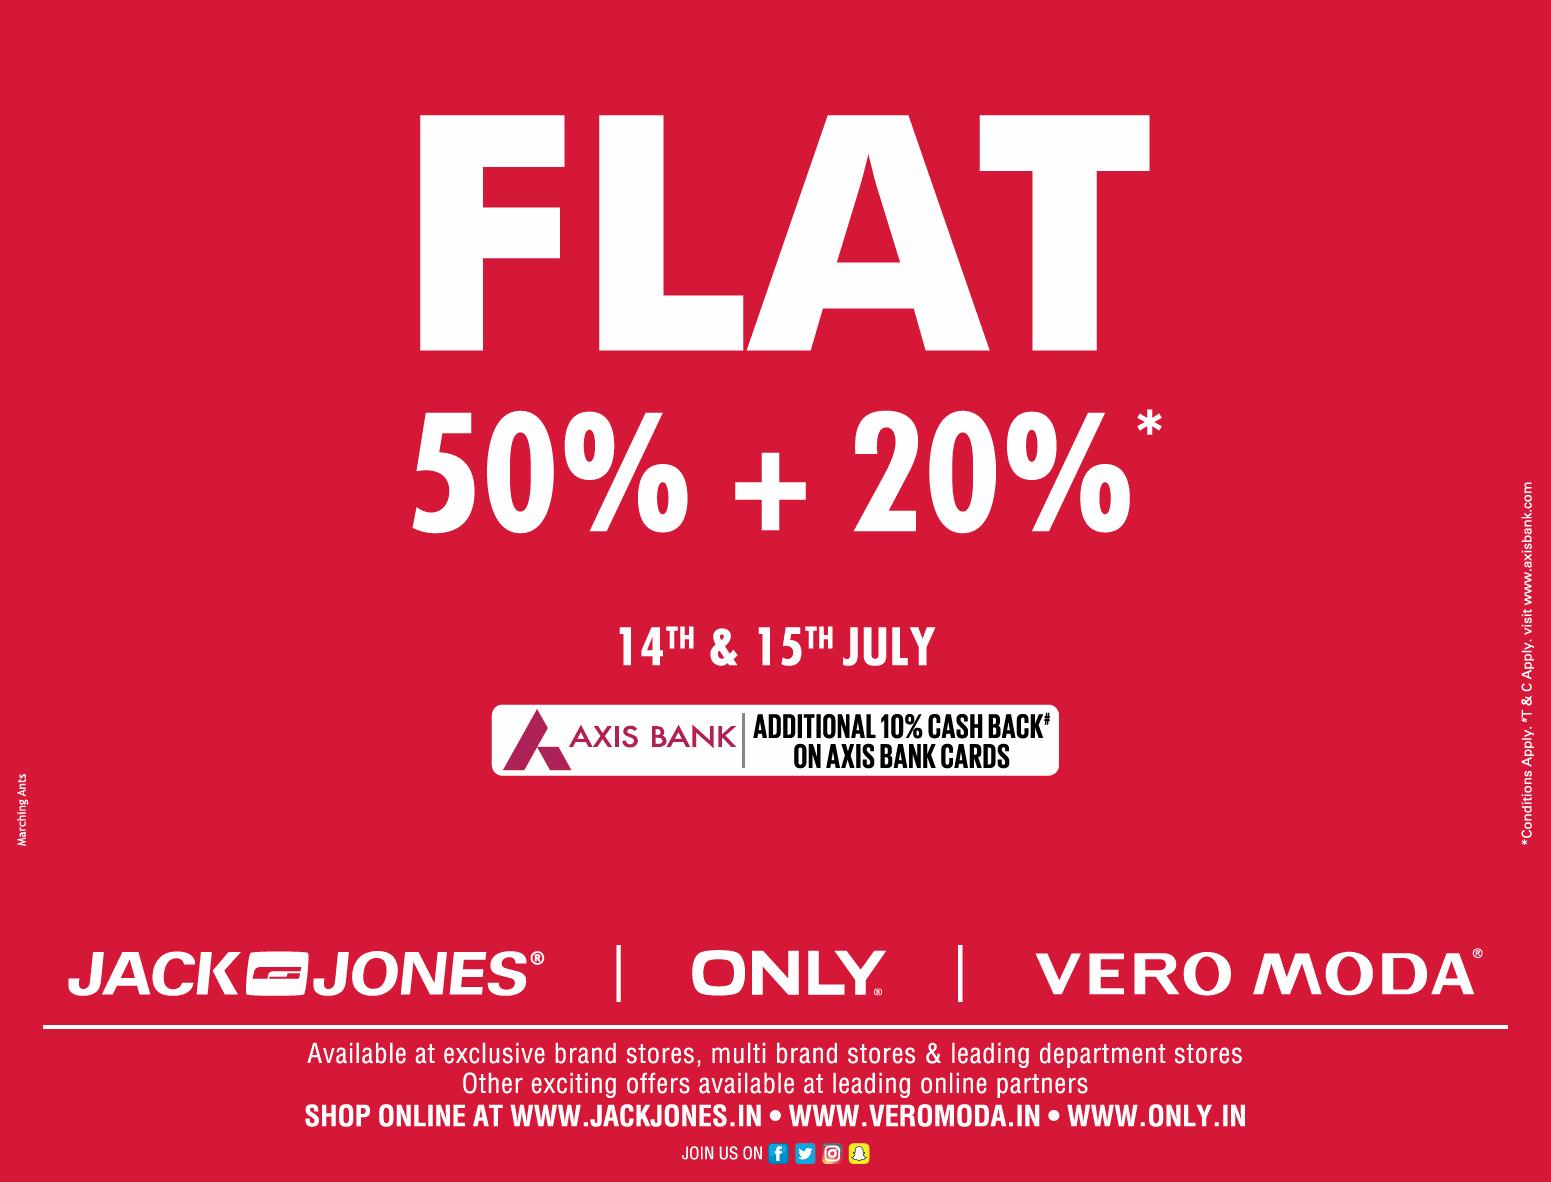 Vero Moda / Jack & Jones / Only - Sale